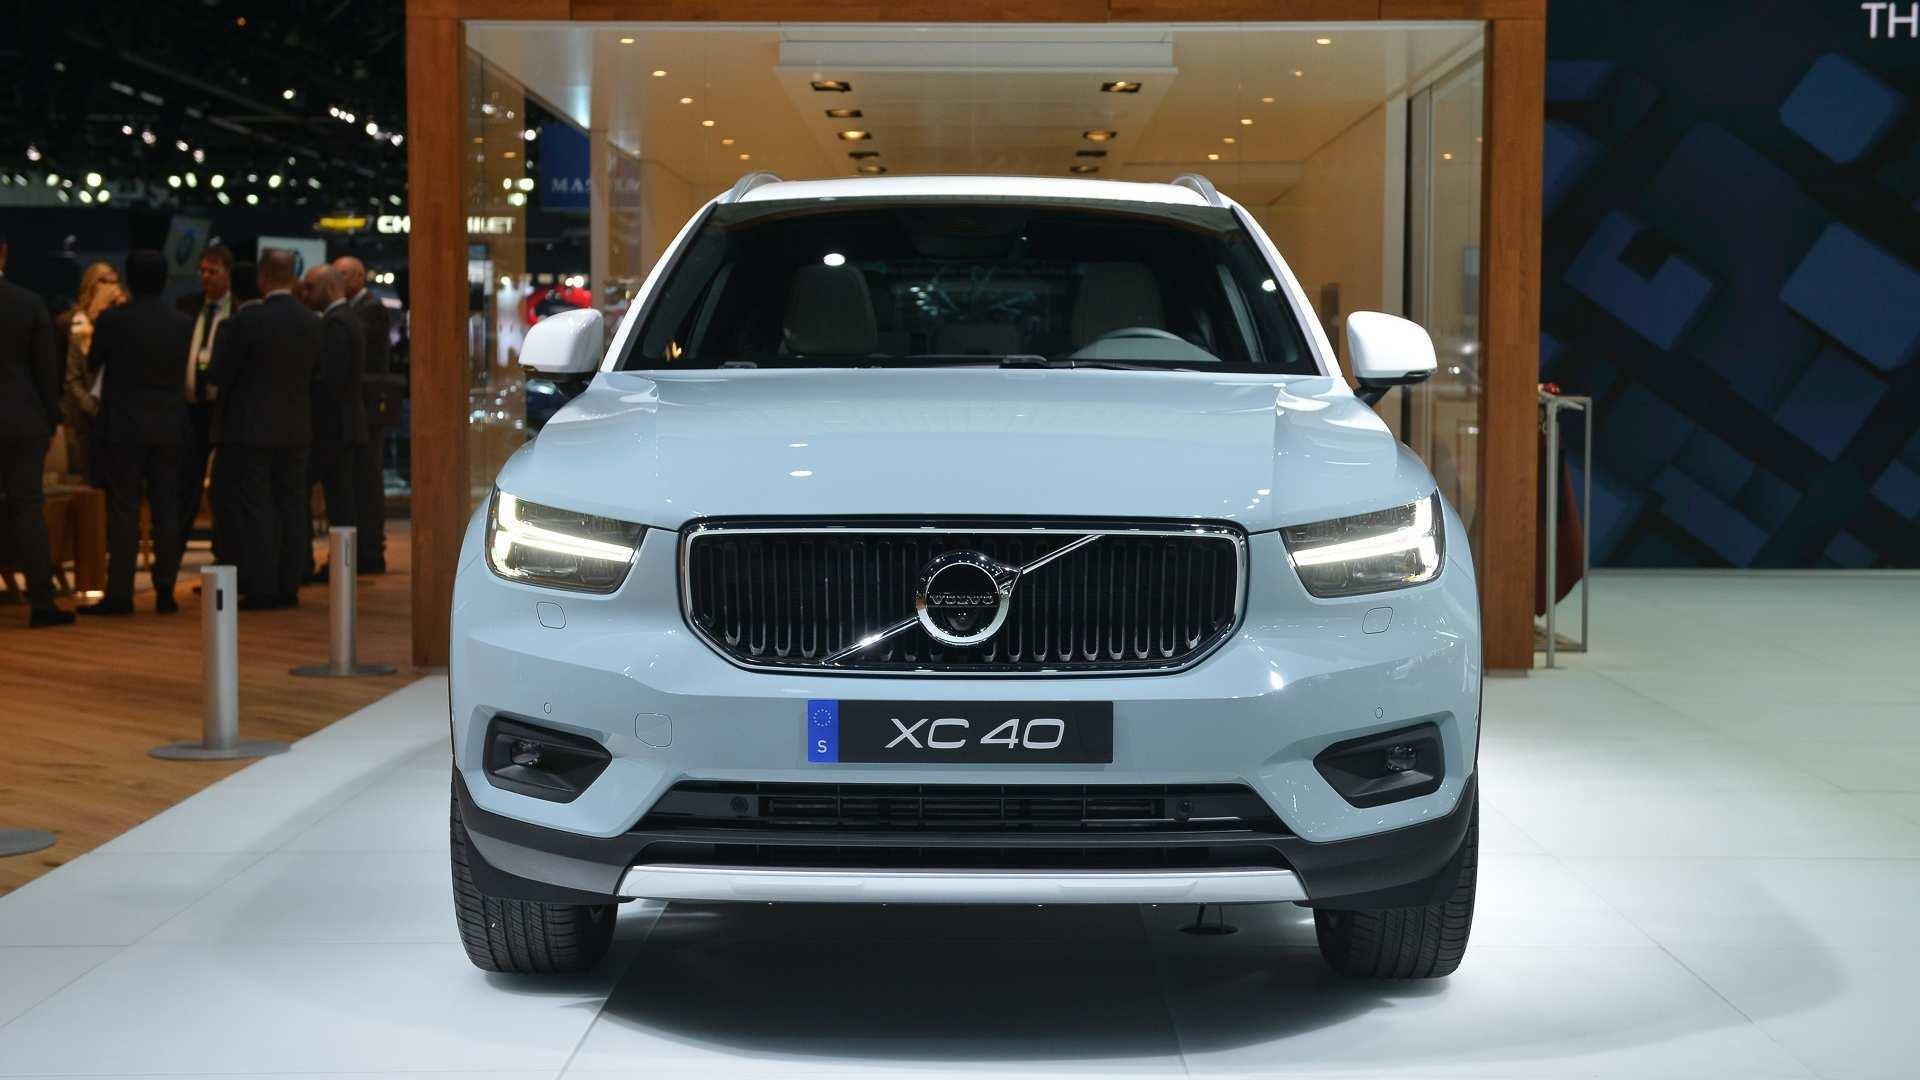 87 New Volvo Modellar 2019 Rumor New Concept for Volvo Modellar 2019 Rumor